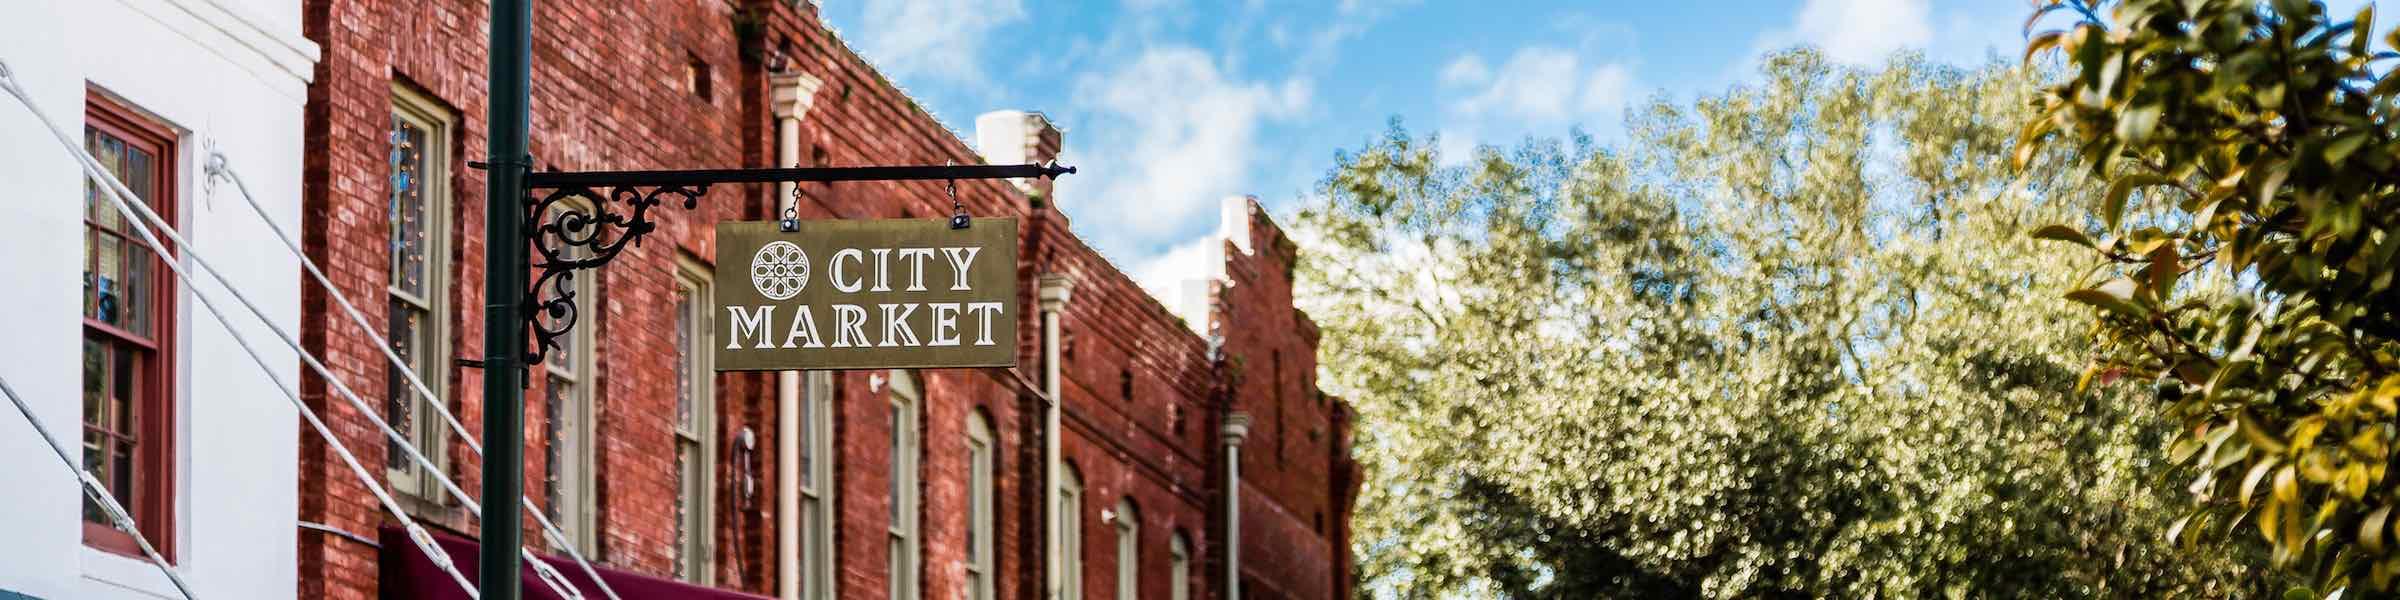 Sign marking Savannah's City Market, between Ellis and Franklin squares.